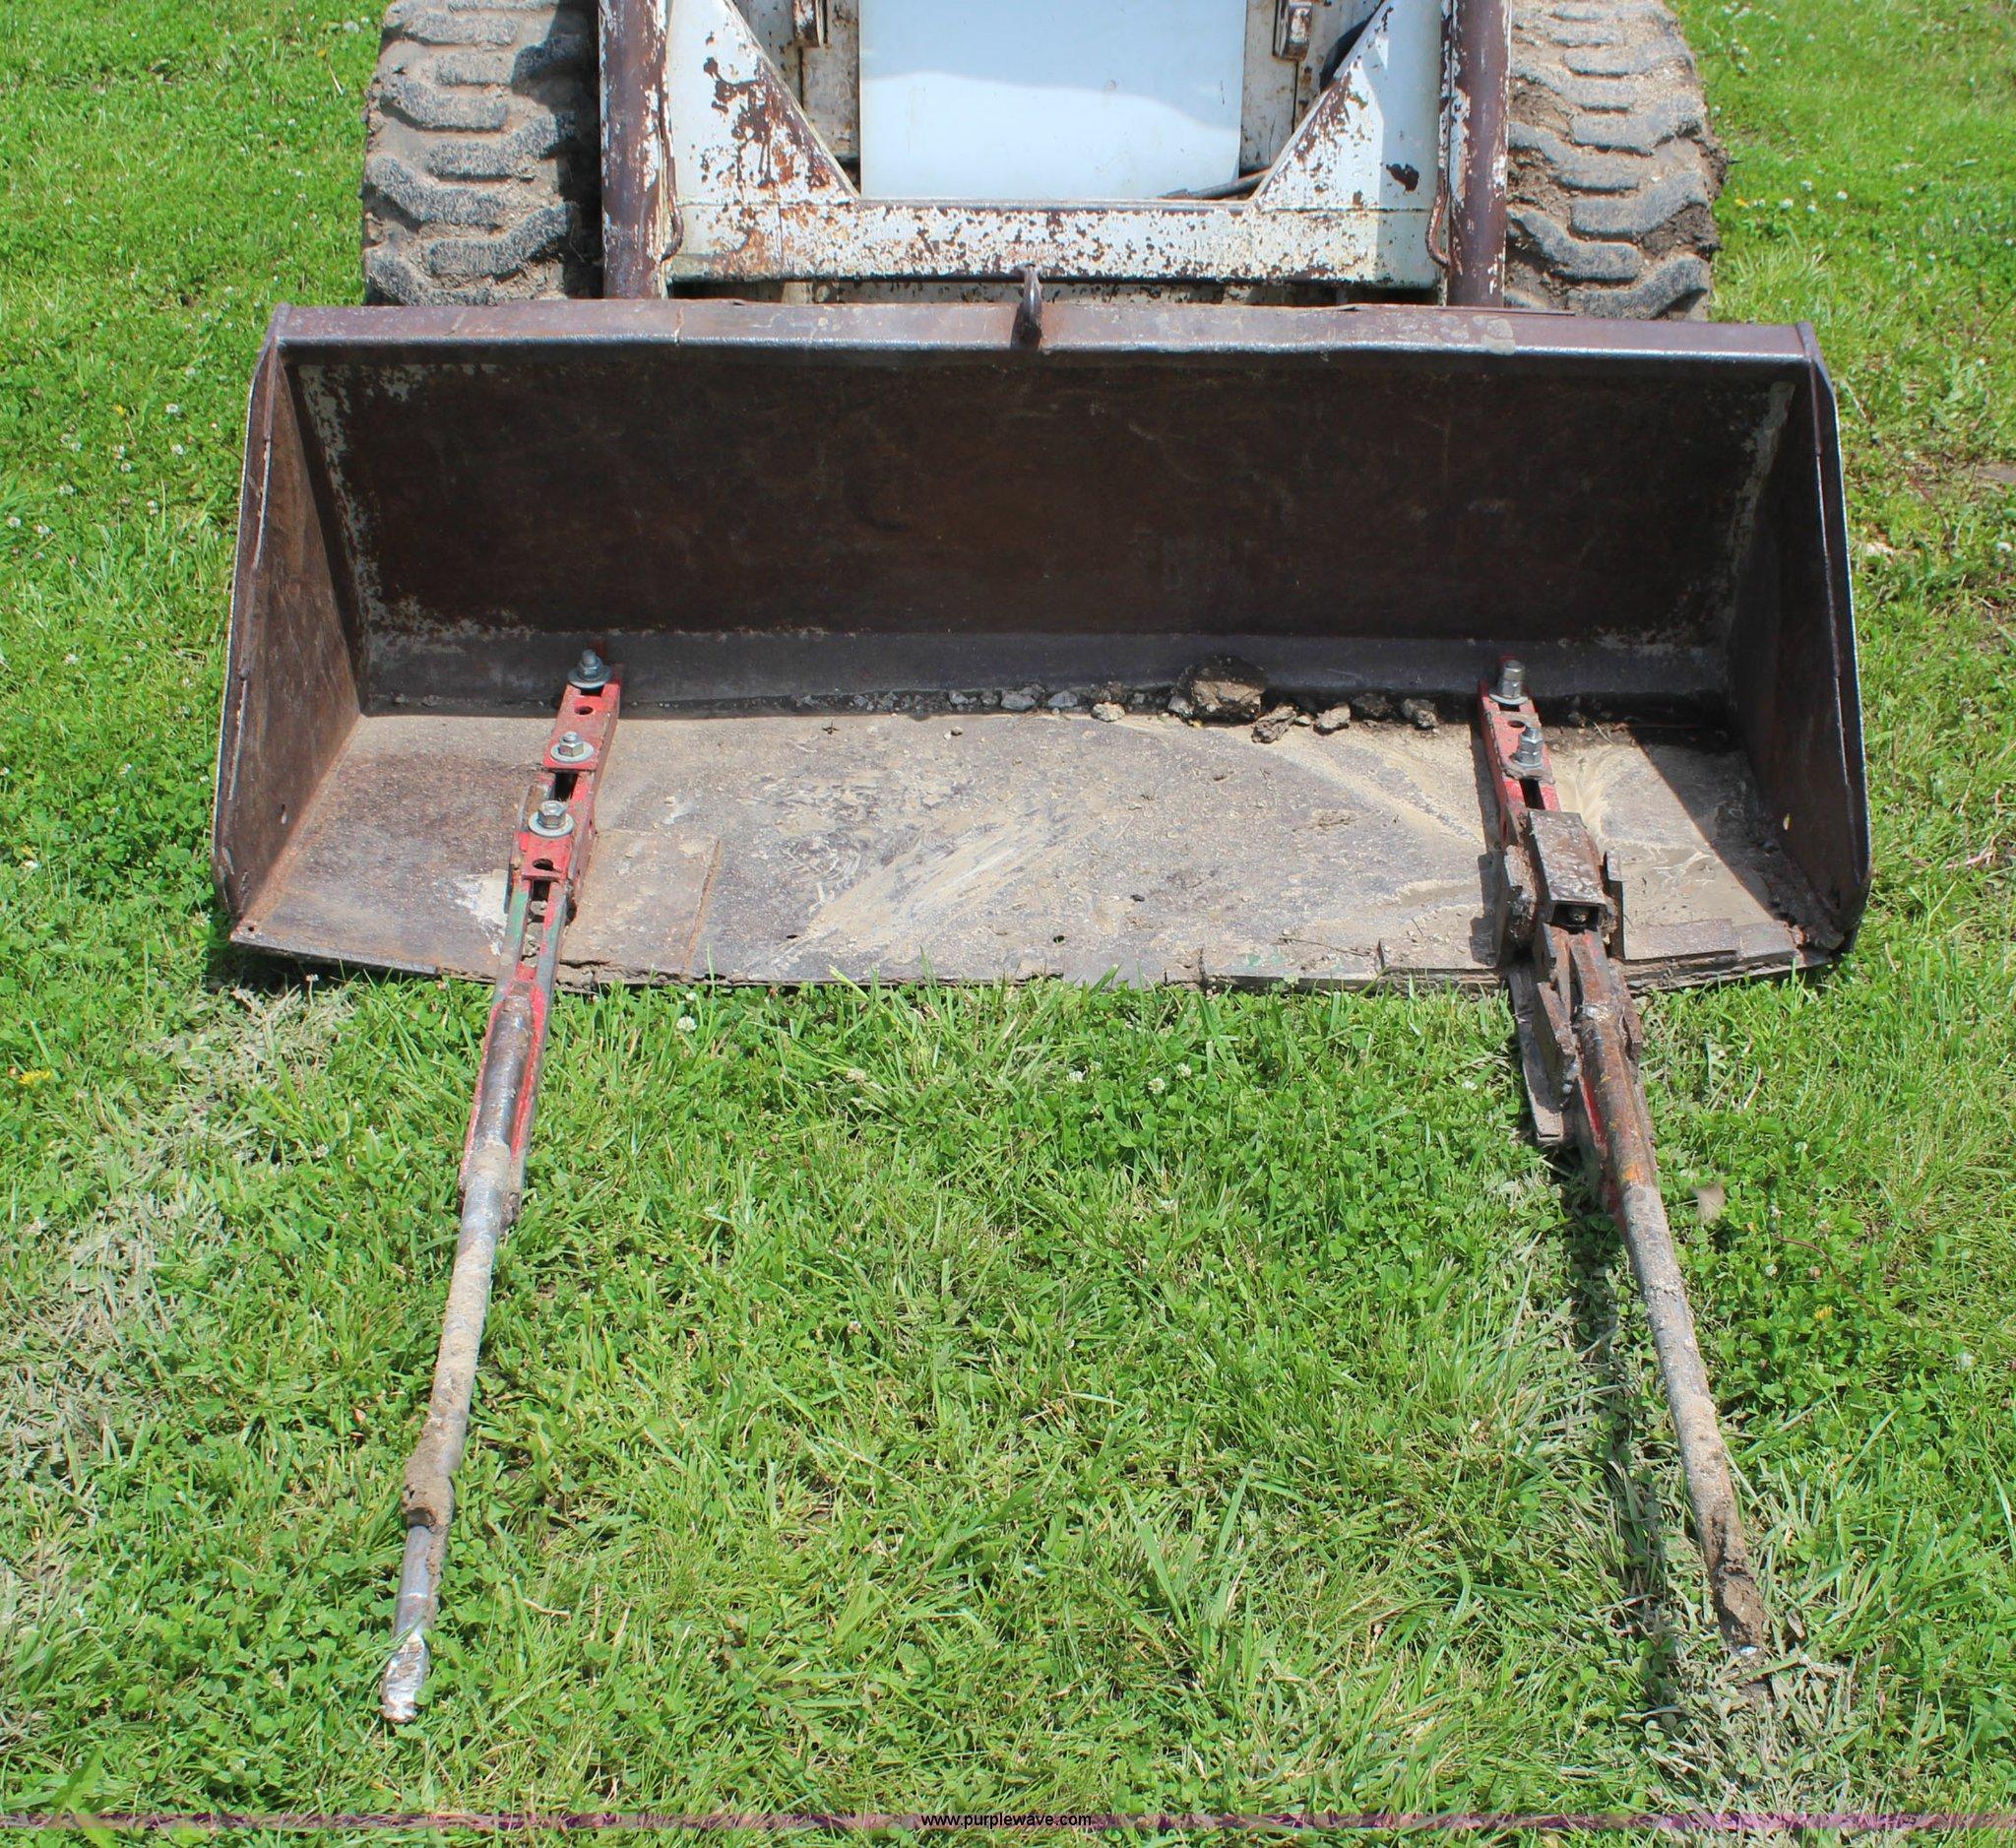 Old Bobcat M700 Skid Steer – A Murti Schofield